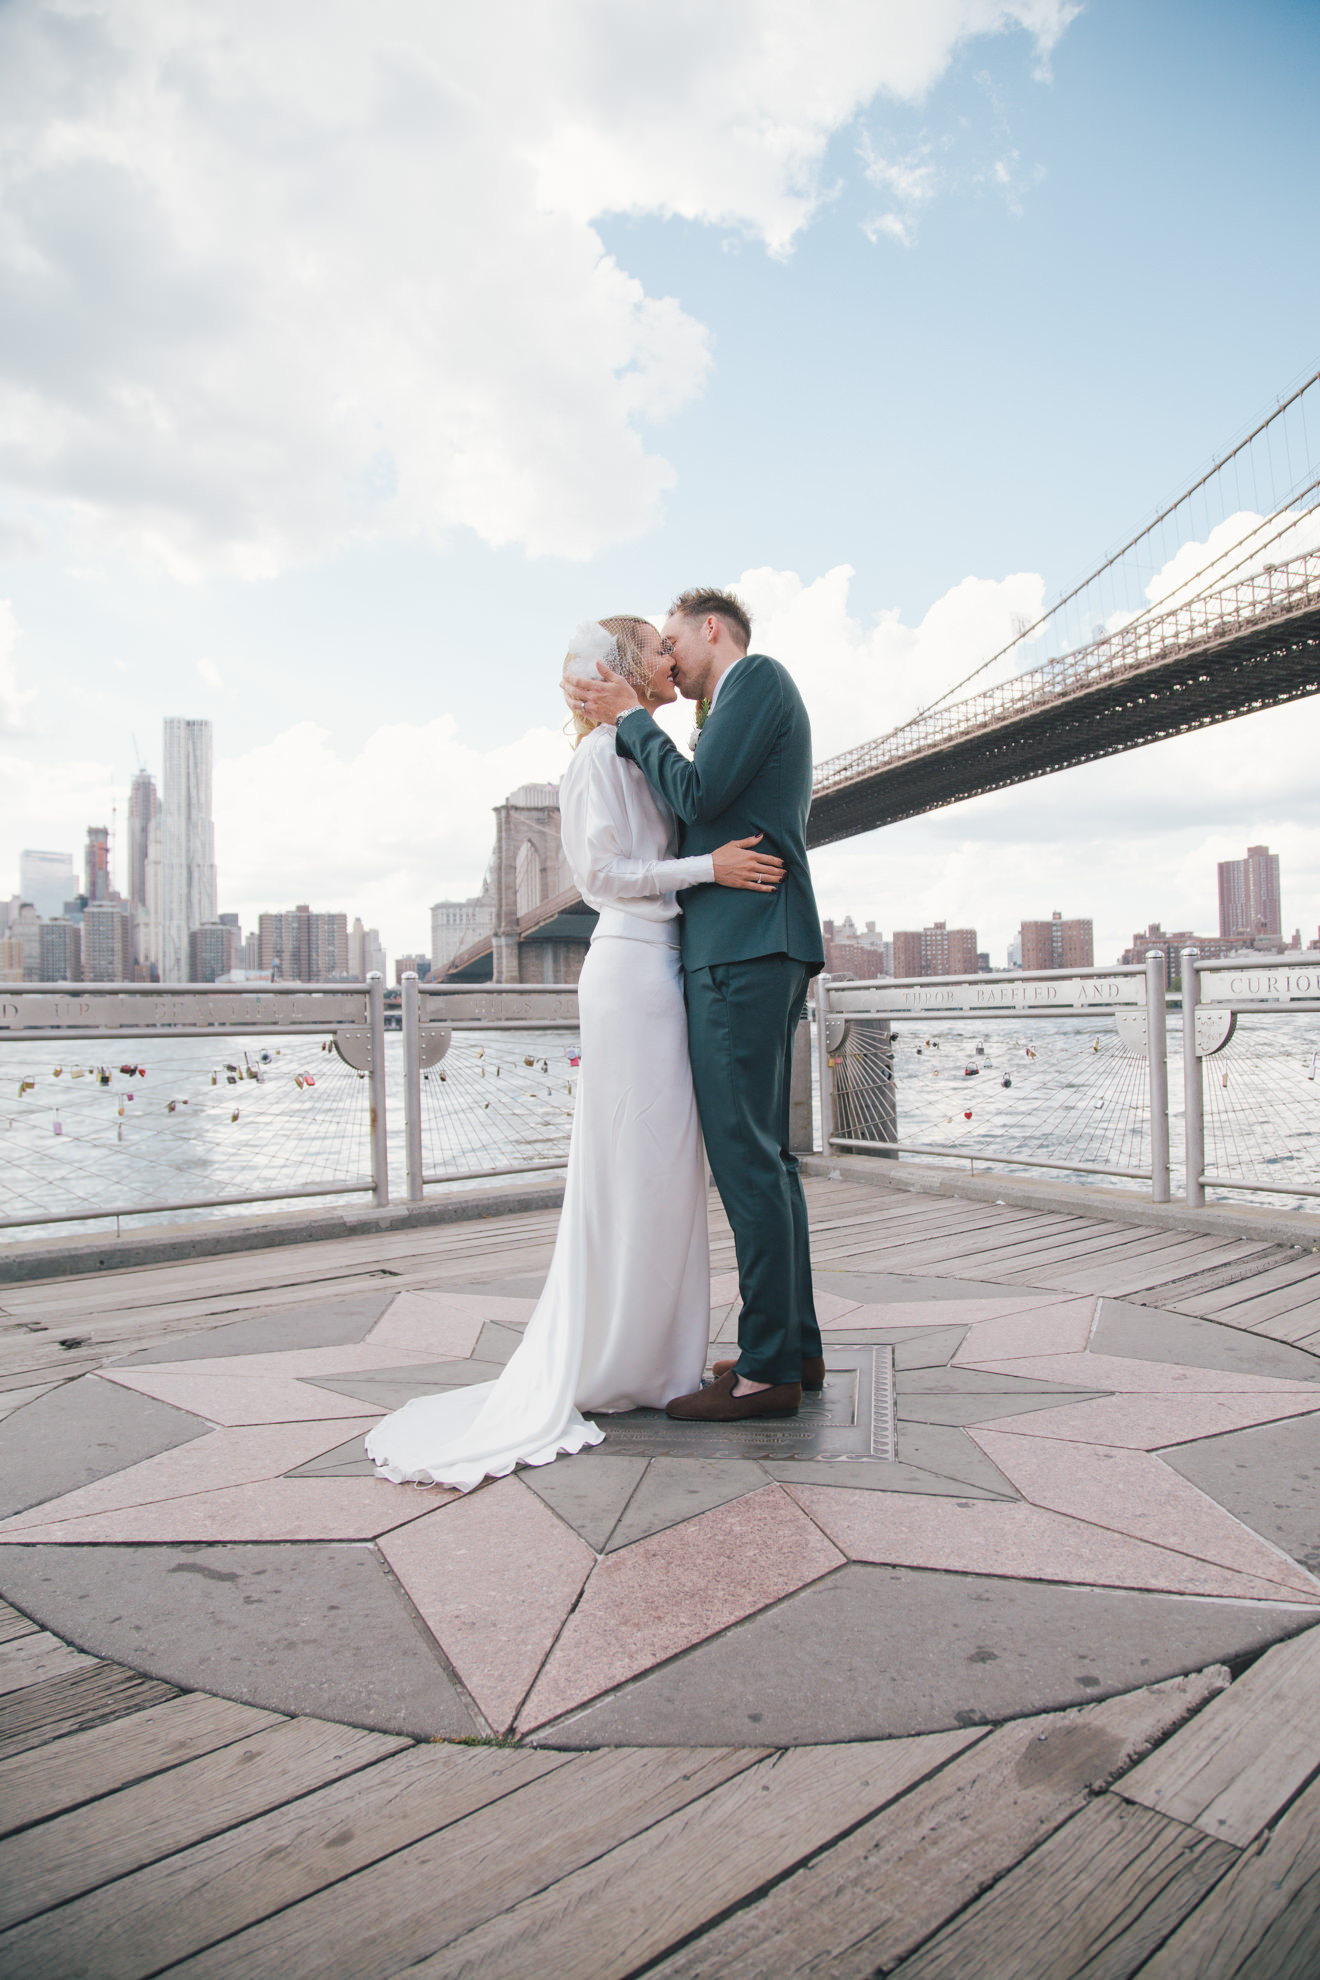 www.taylorlaurenbarker.com // destination wedding photojournalist